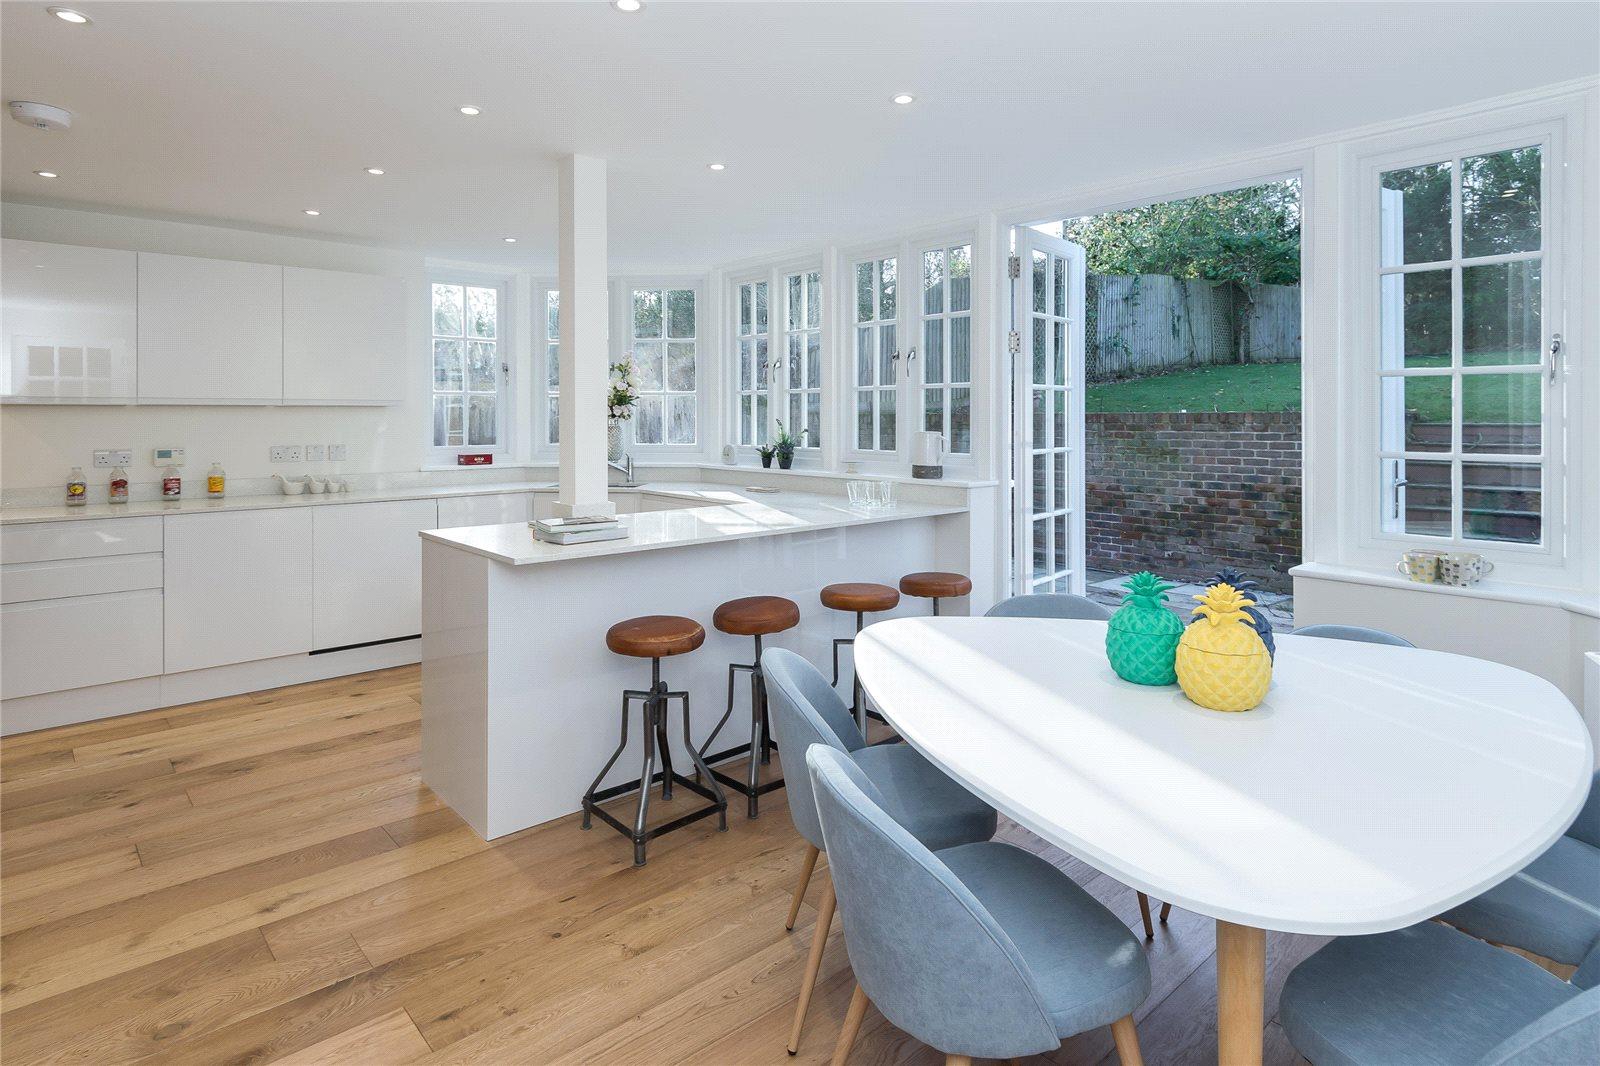 Woodlands, Gerrards Cross, Buckinghamshire, SL9: a luxury home for ...